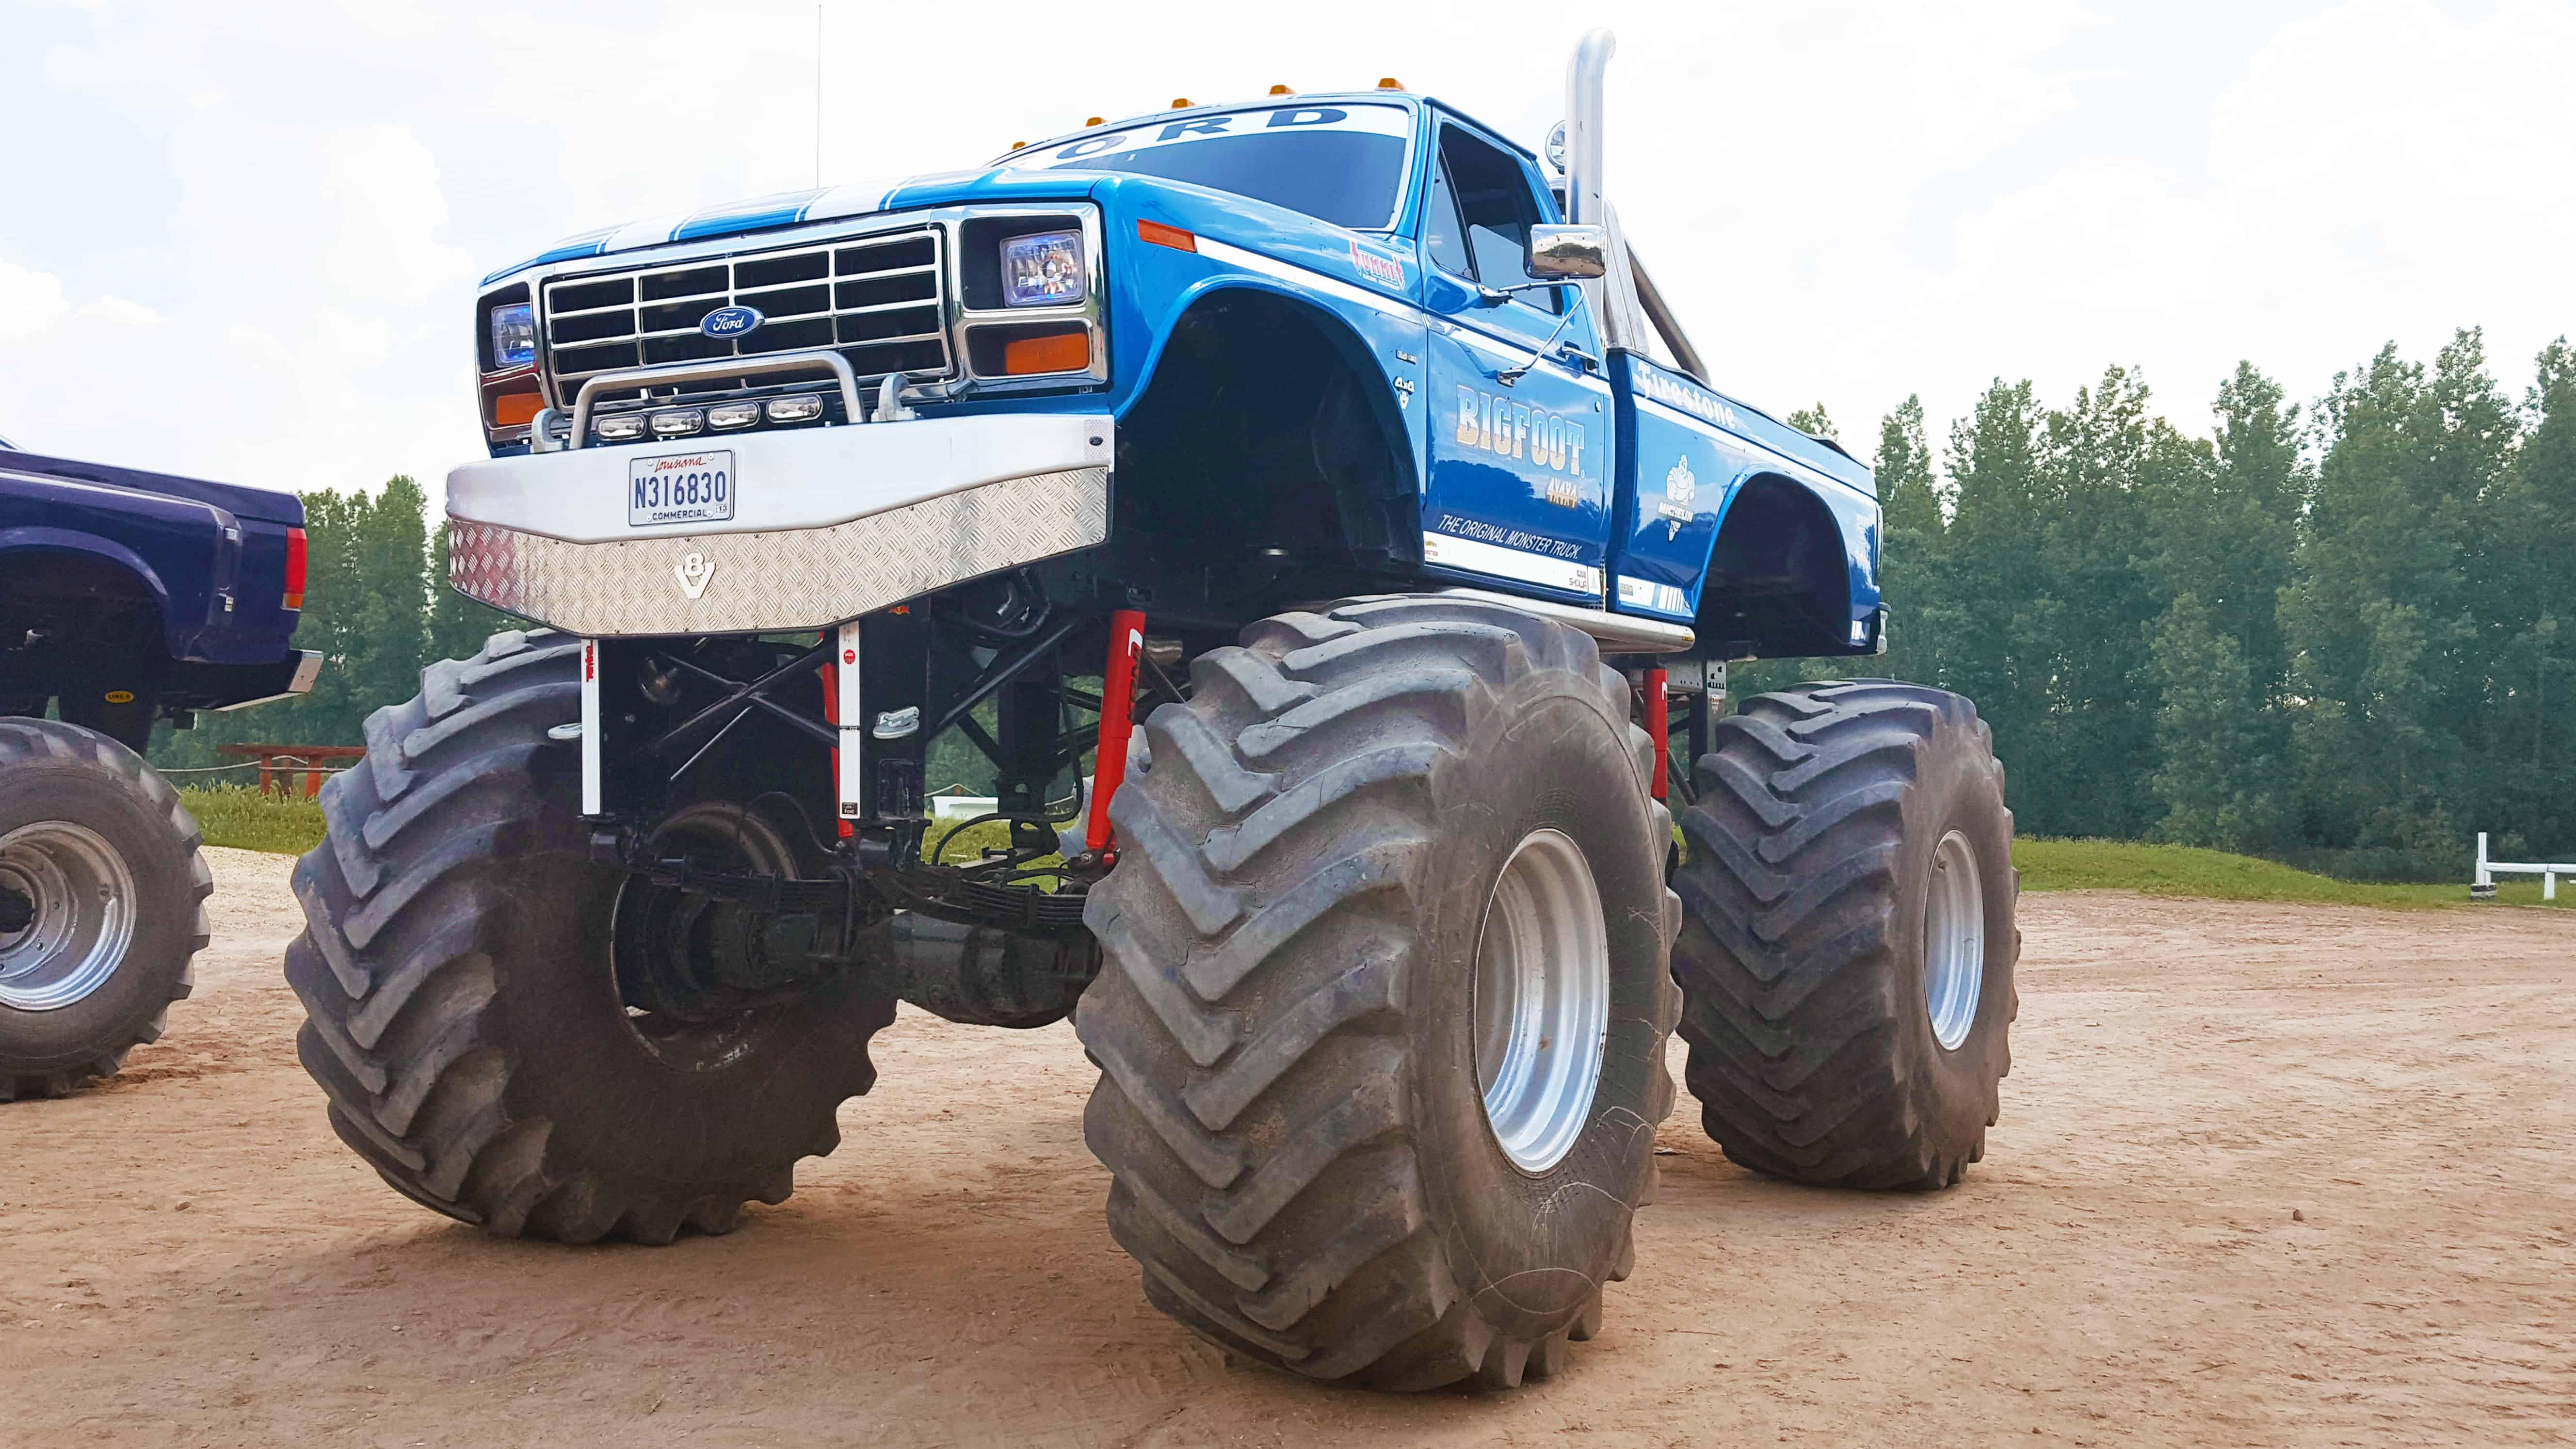 Ford F150 Bigfoot vezetés